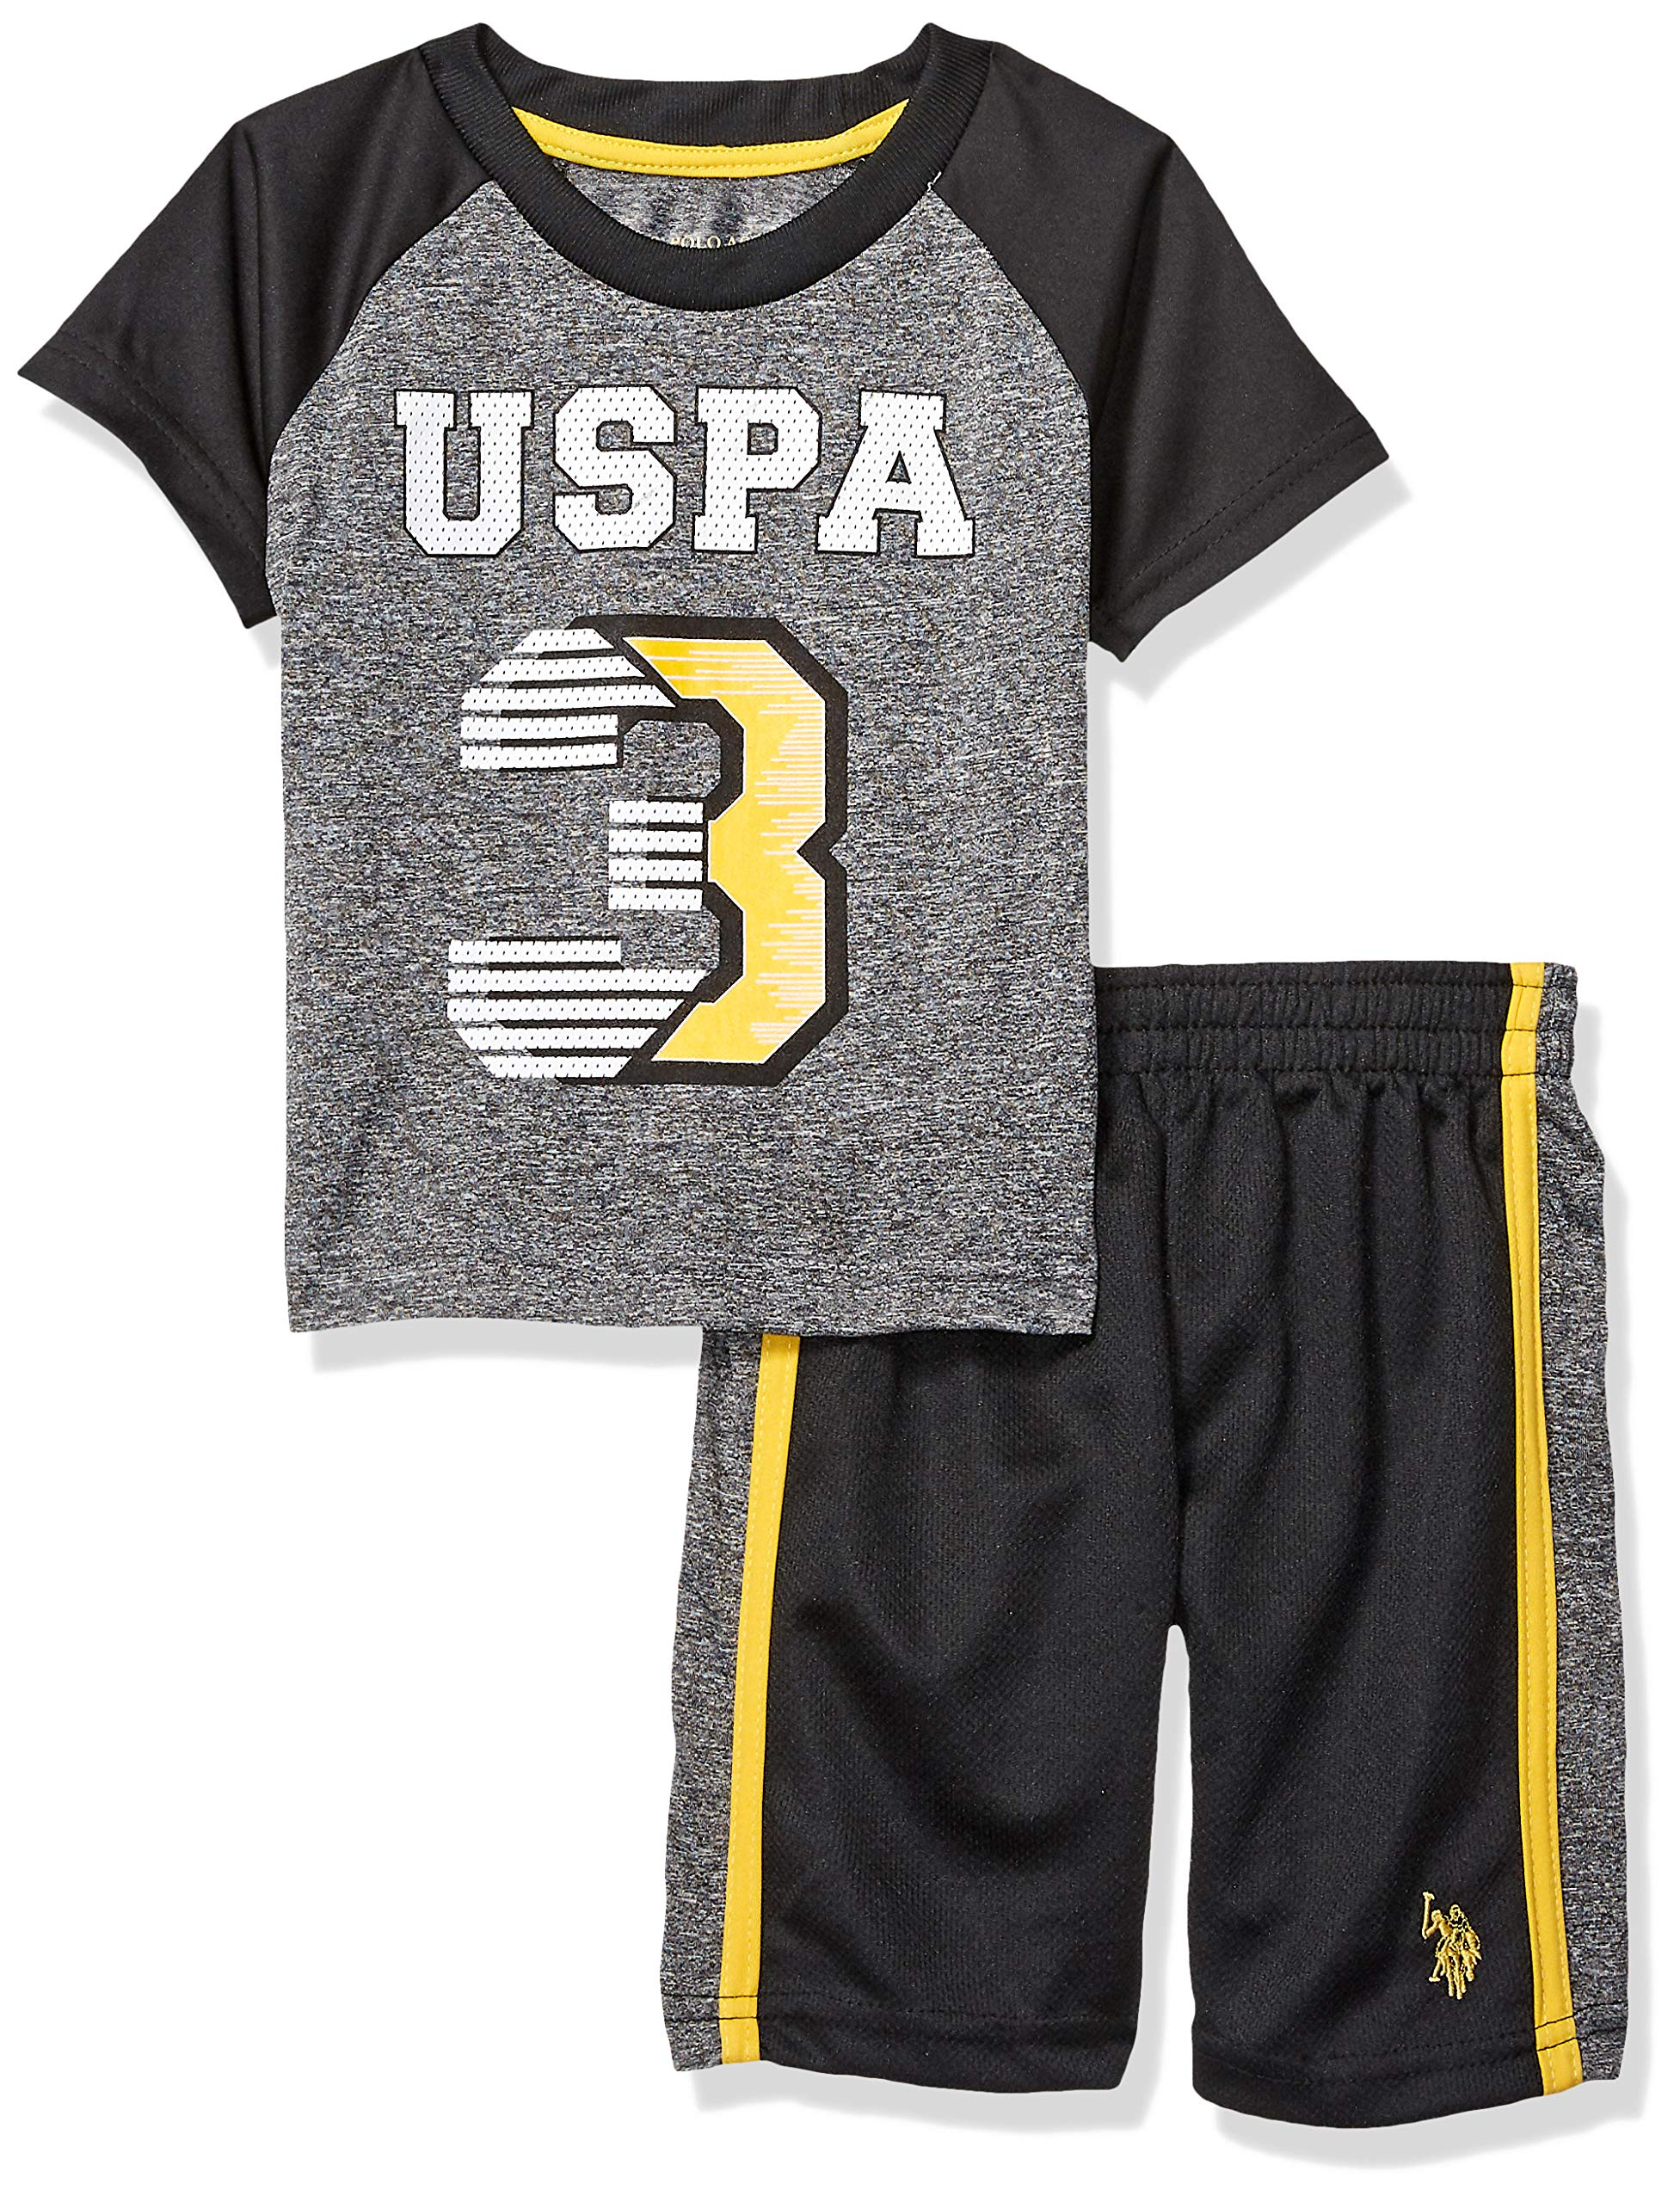 U.S. Polo Assn. Boys' Little 2 Piece Sleeve Athletic T-Shirt and Short Set, Gold, 7